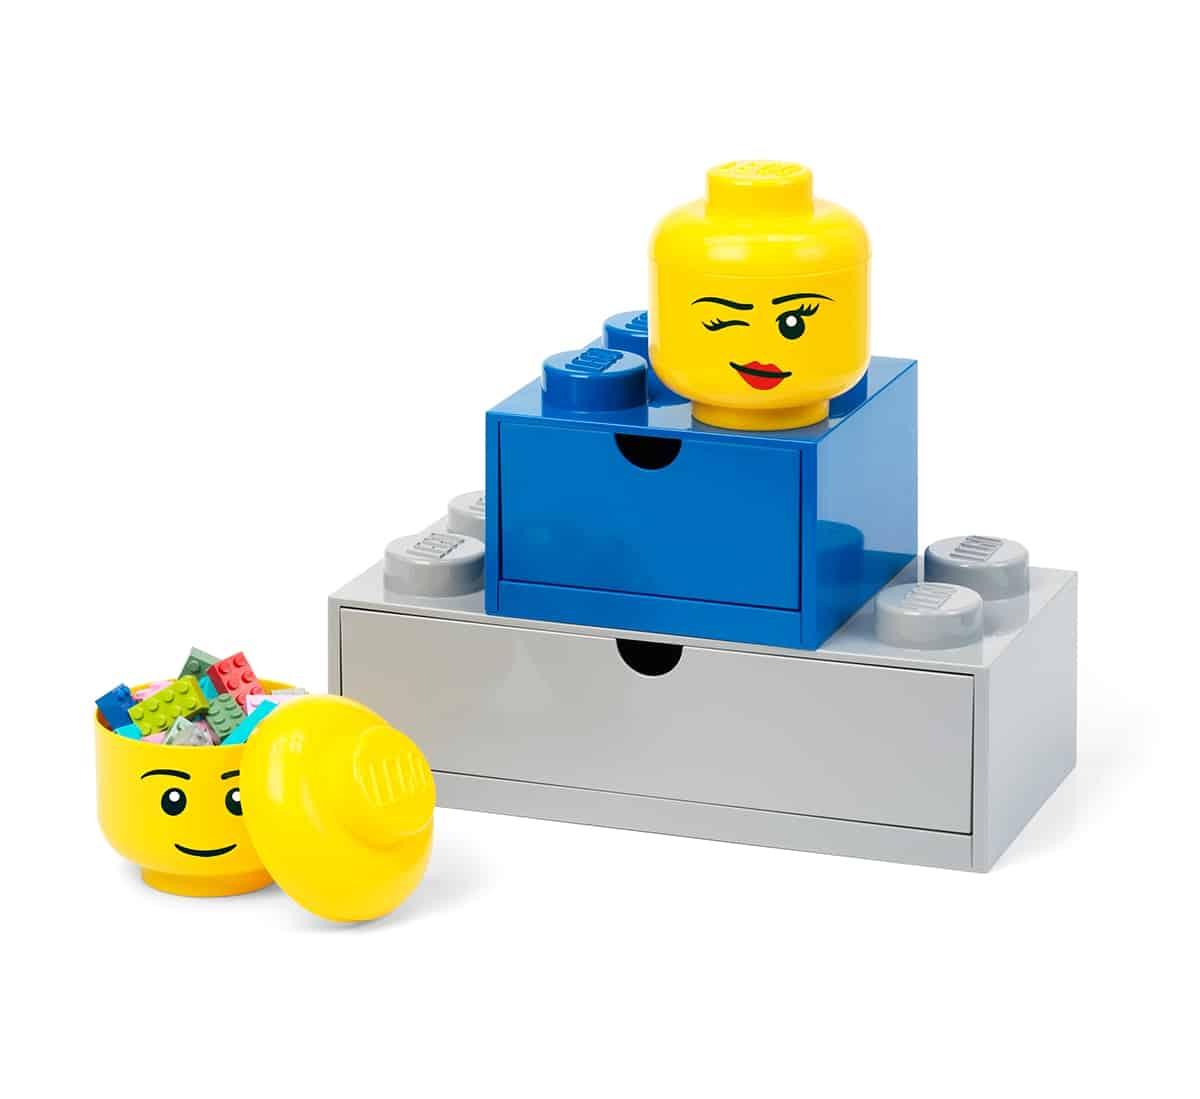 lego 5006211 storage head mini winking